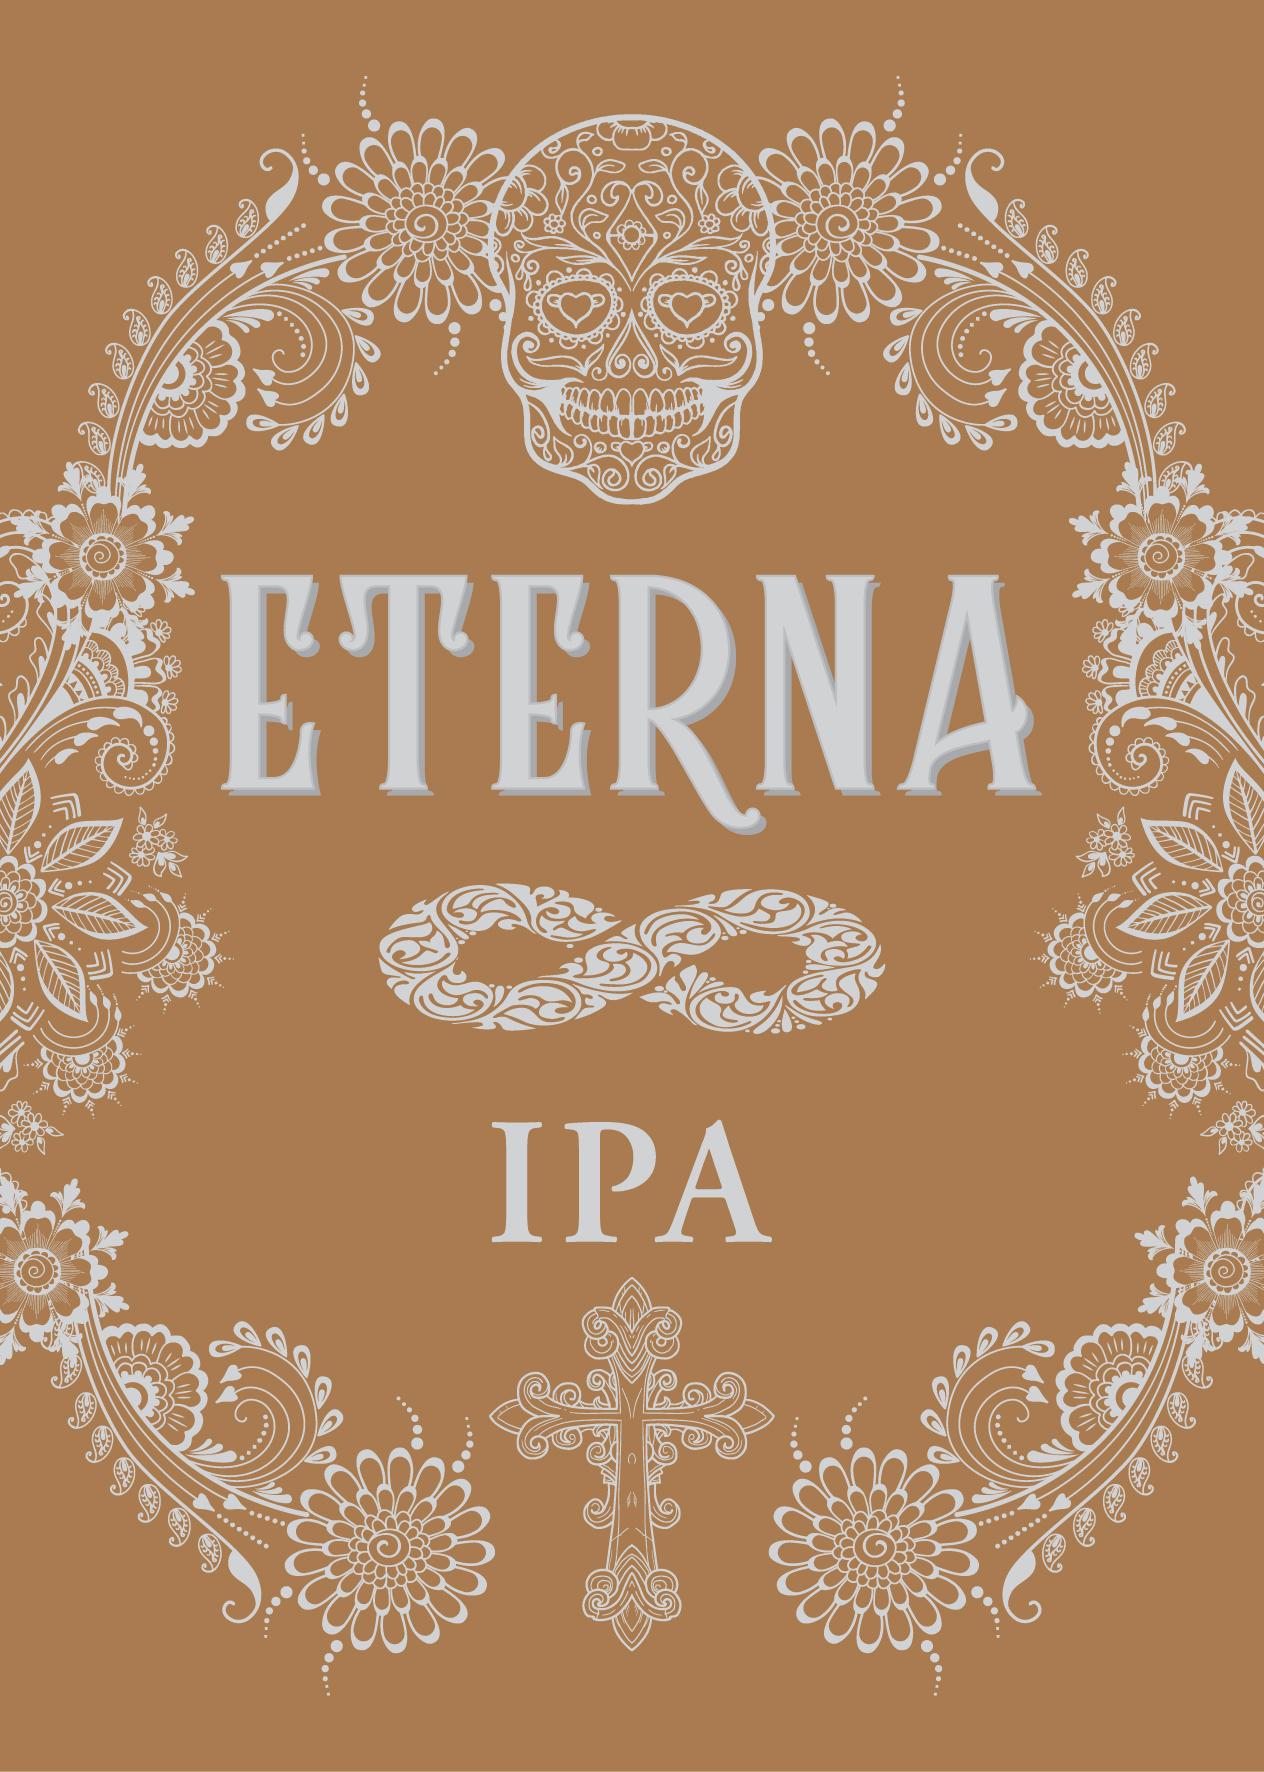 Cervezas Eterna (Beer Bang)